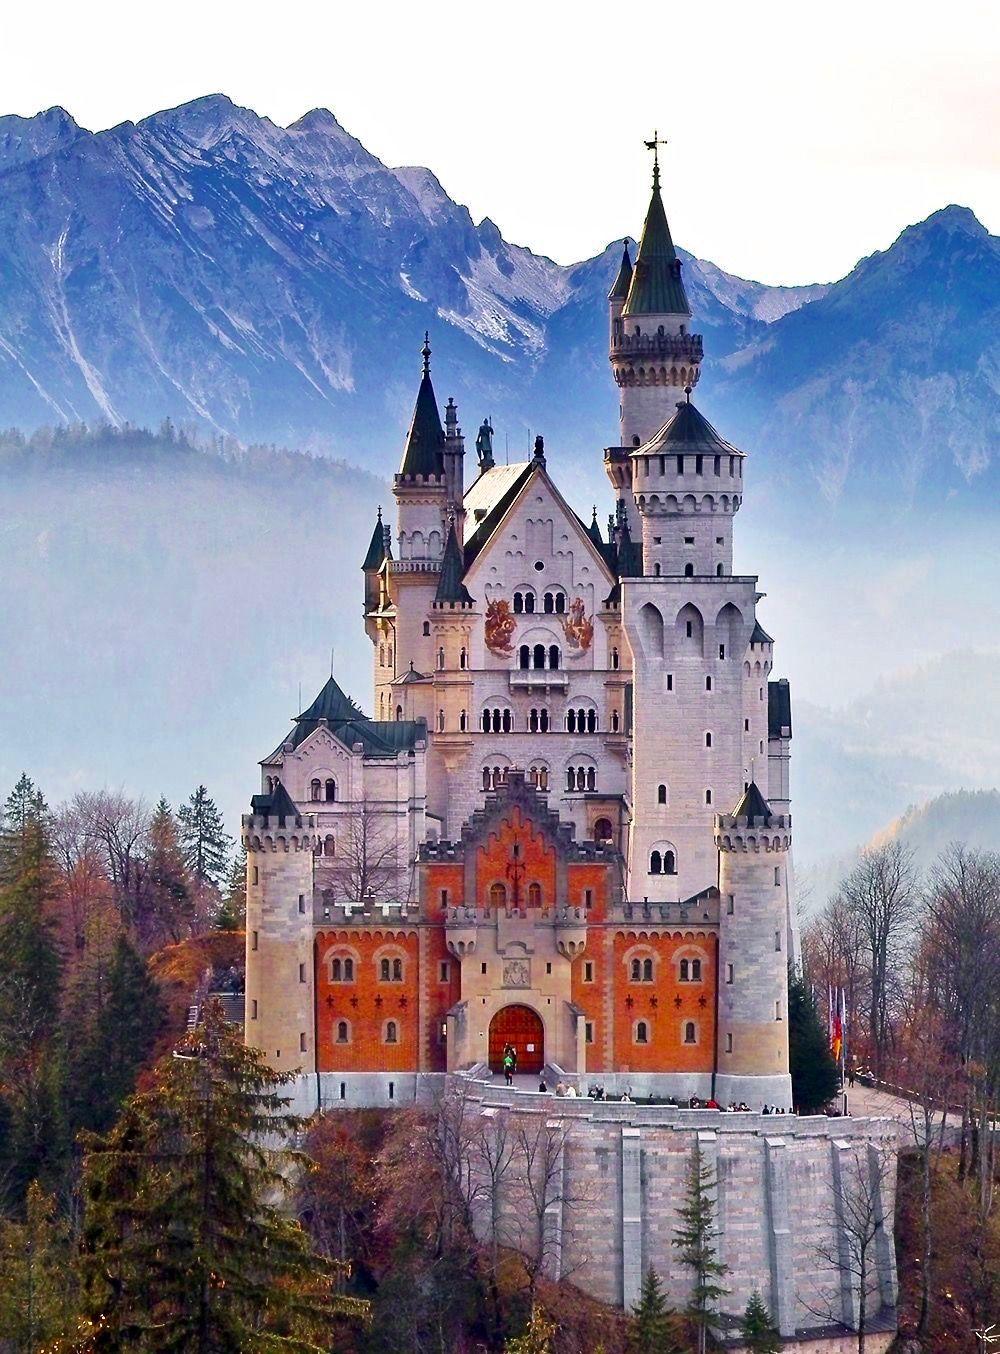 Ultimate Guide To Neuschwanstein Castle In Bavaria Germany Neuschwanstein Castle Castle Romantic Destinations